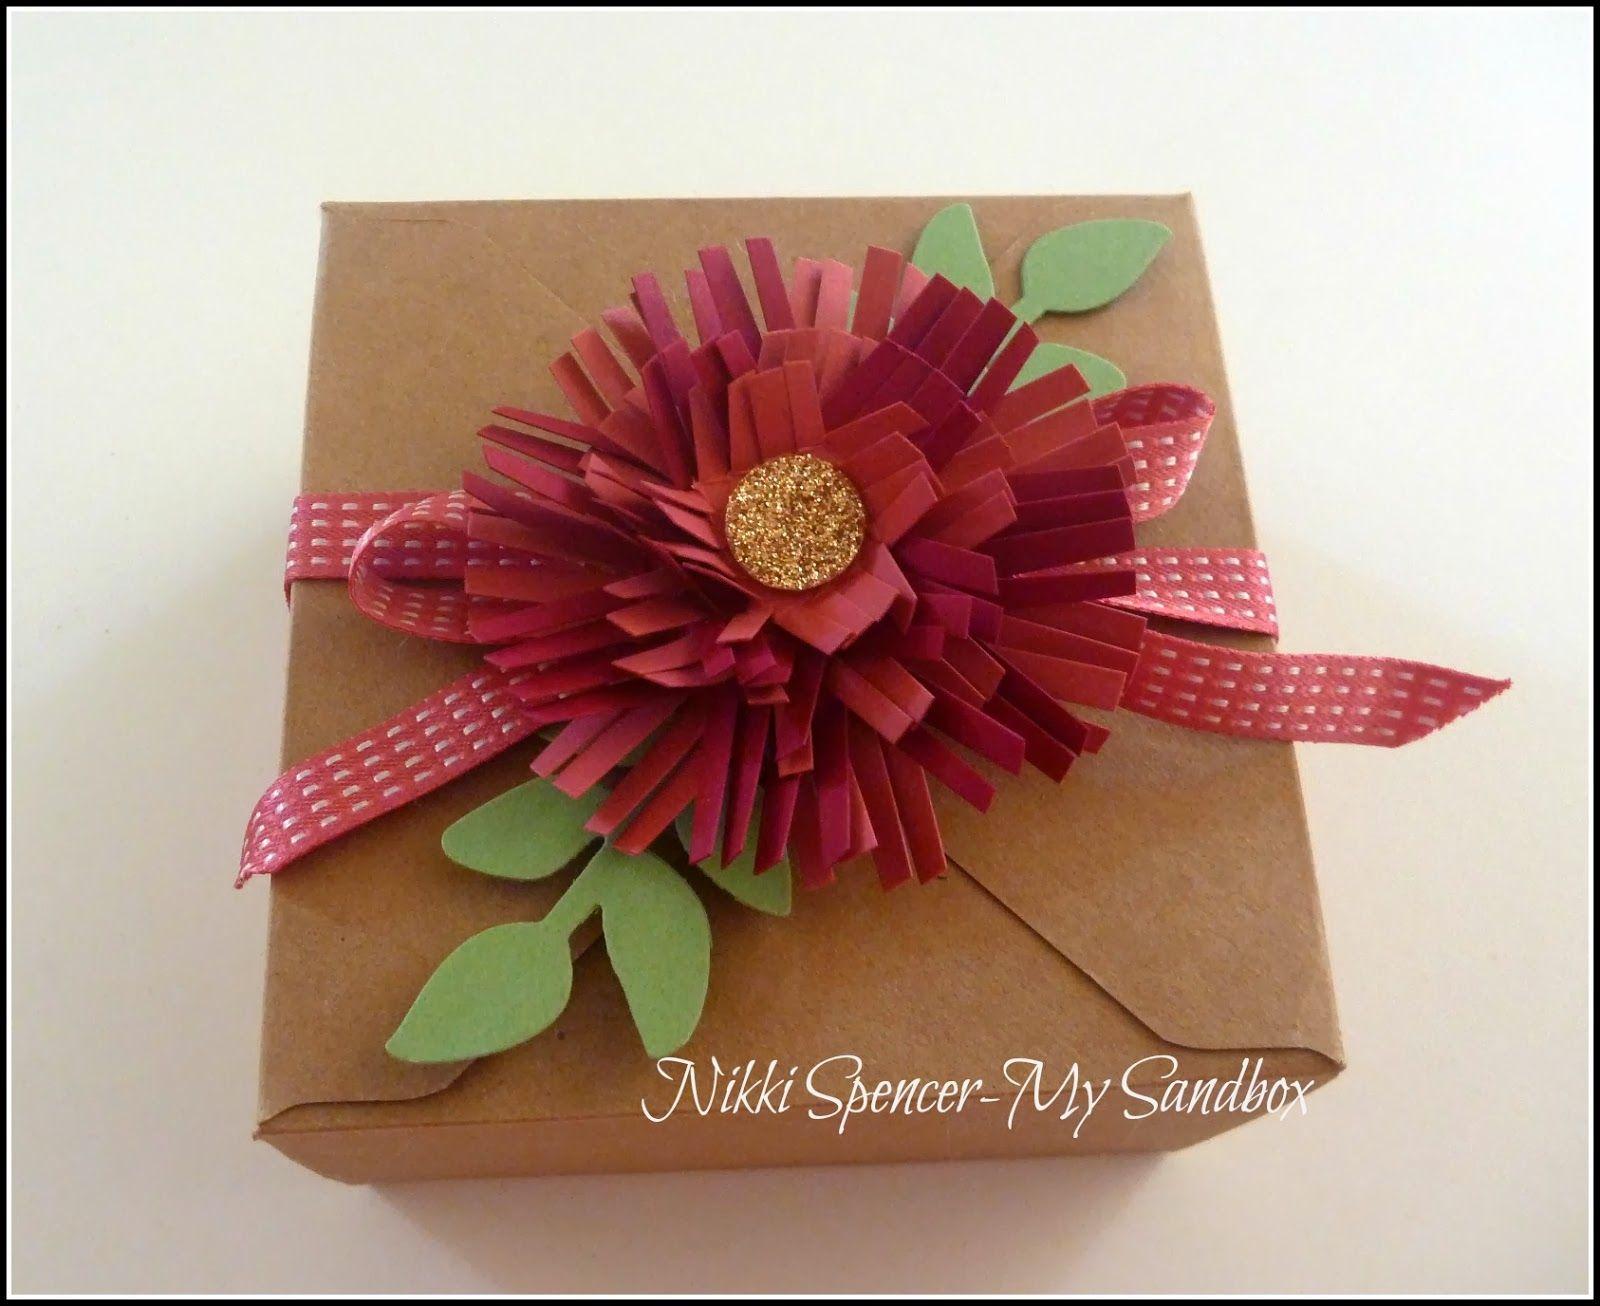 Flower paper craft tutorial yelomphonecompany flower paper craft tutorial mightylinksfo